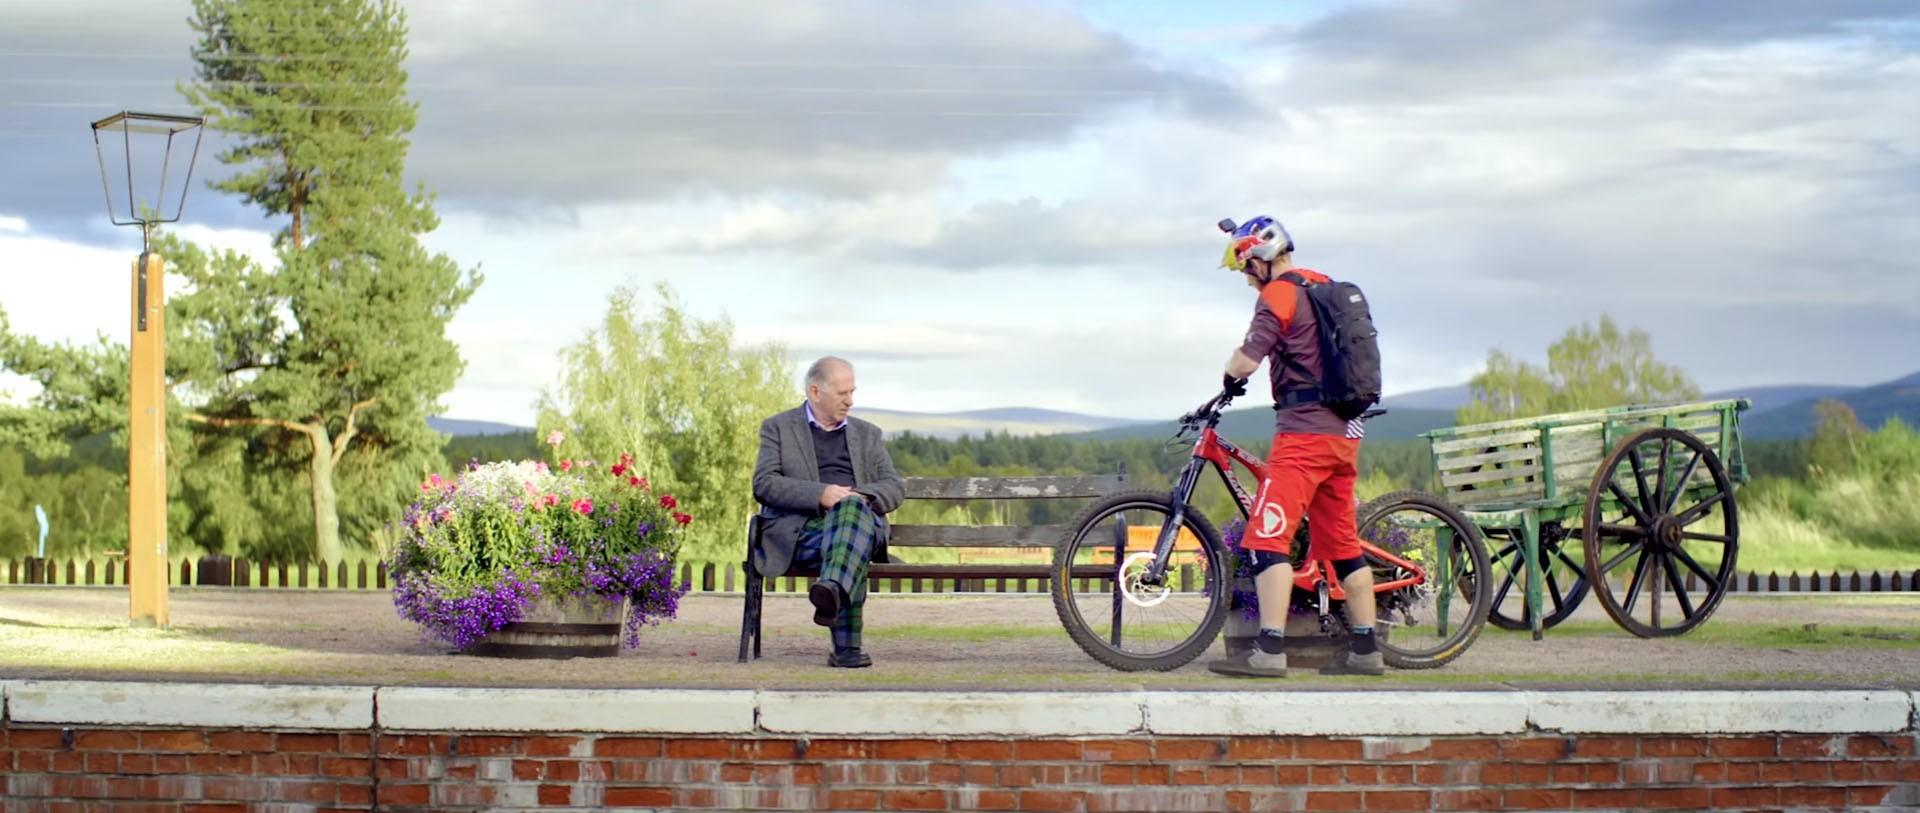 danny macaskill s latest clip is a tourism brochure for scotland   autoevolution